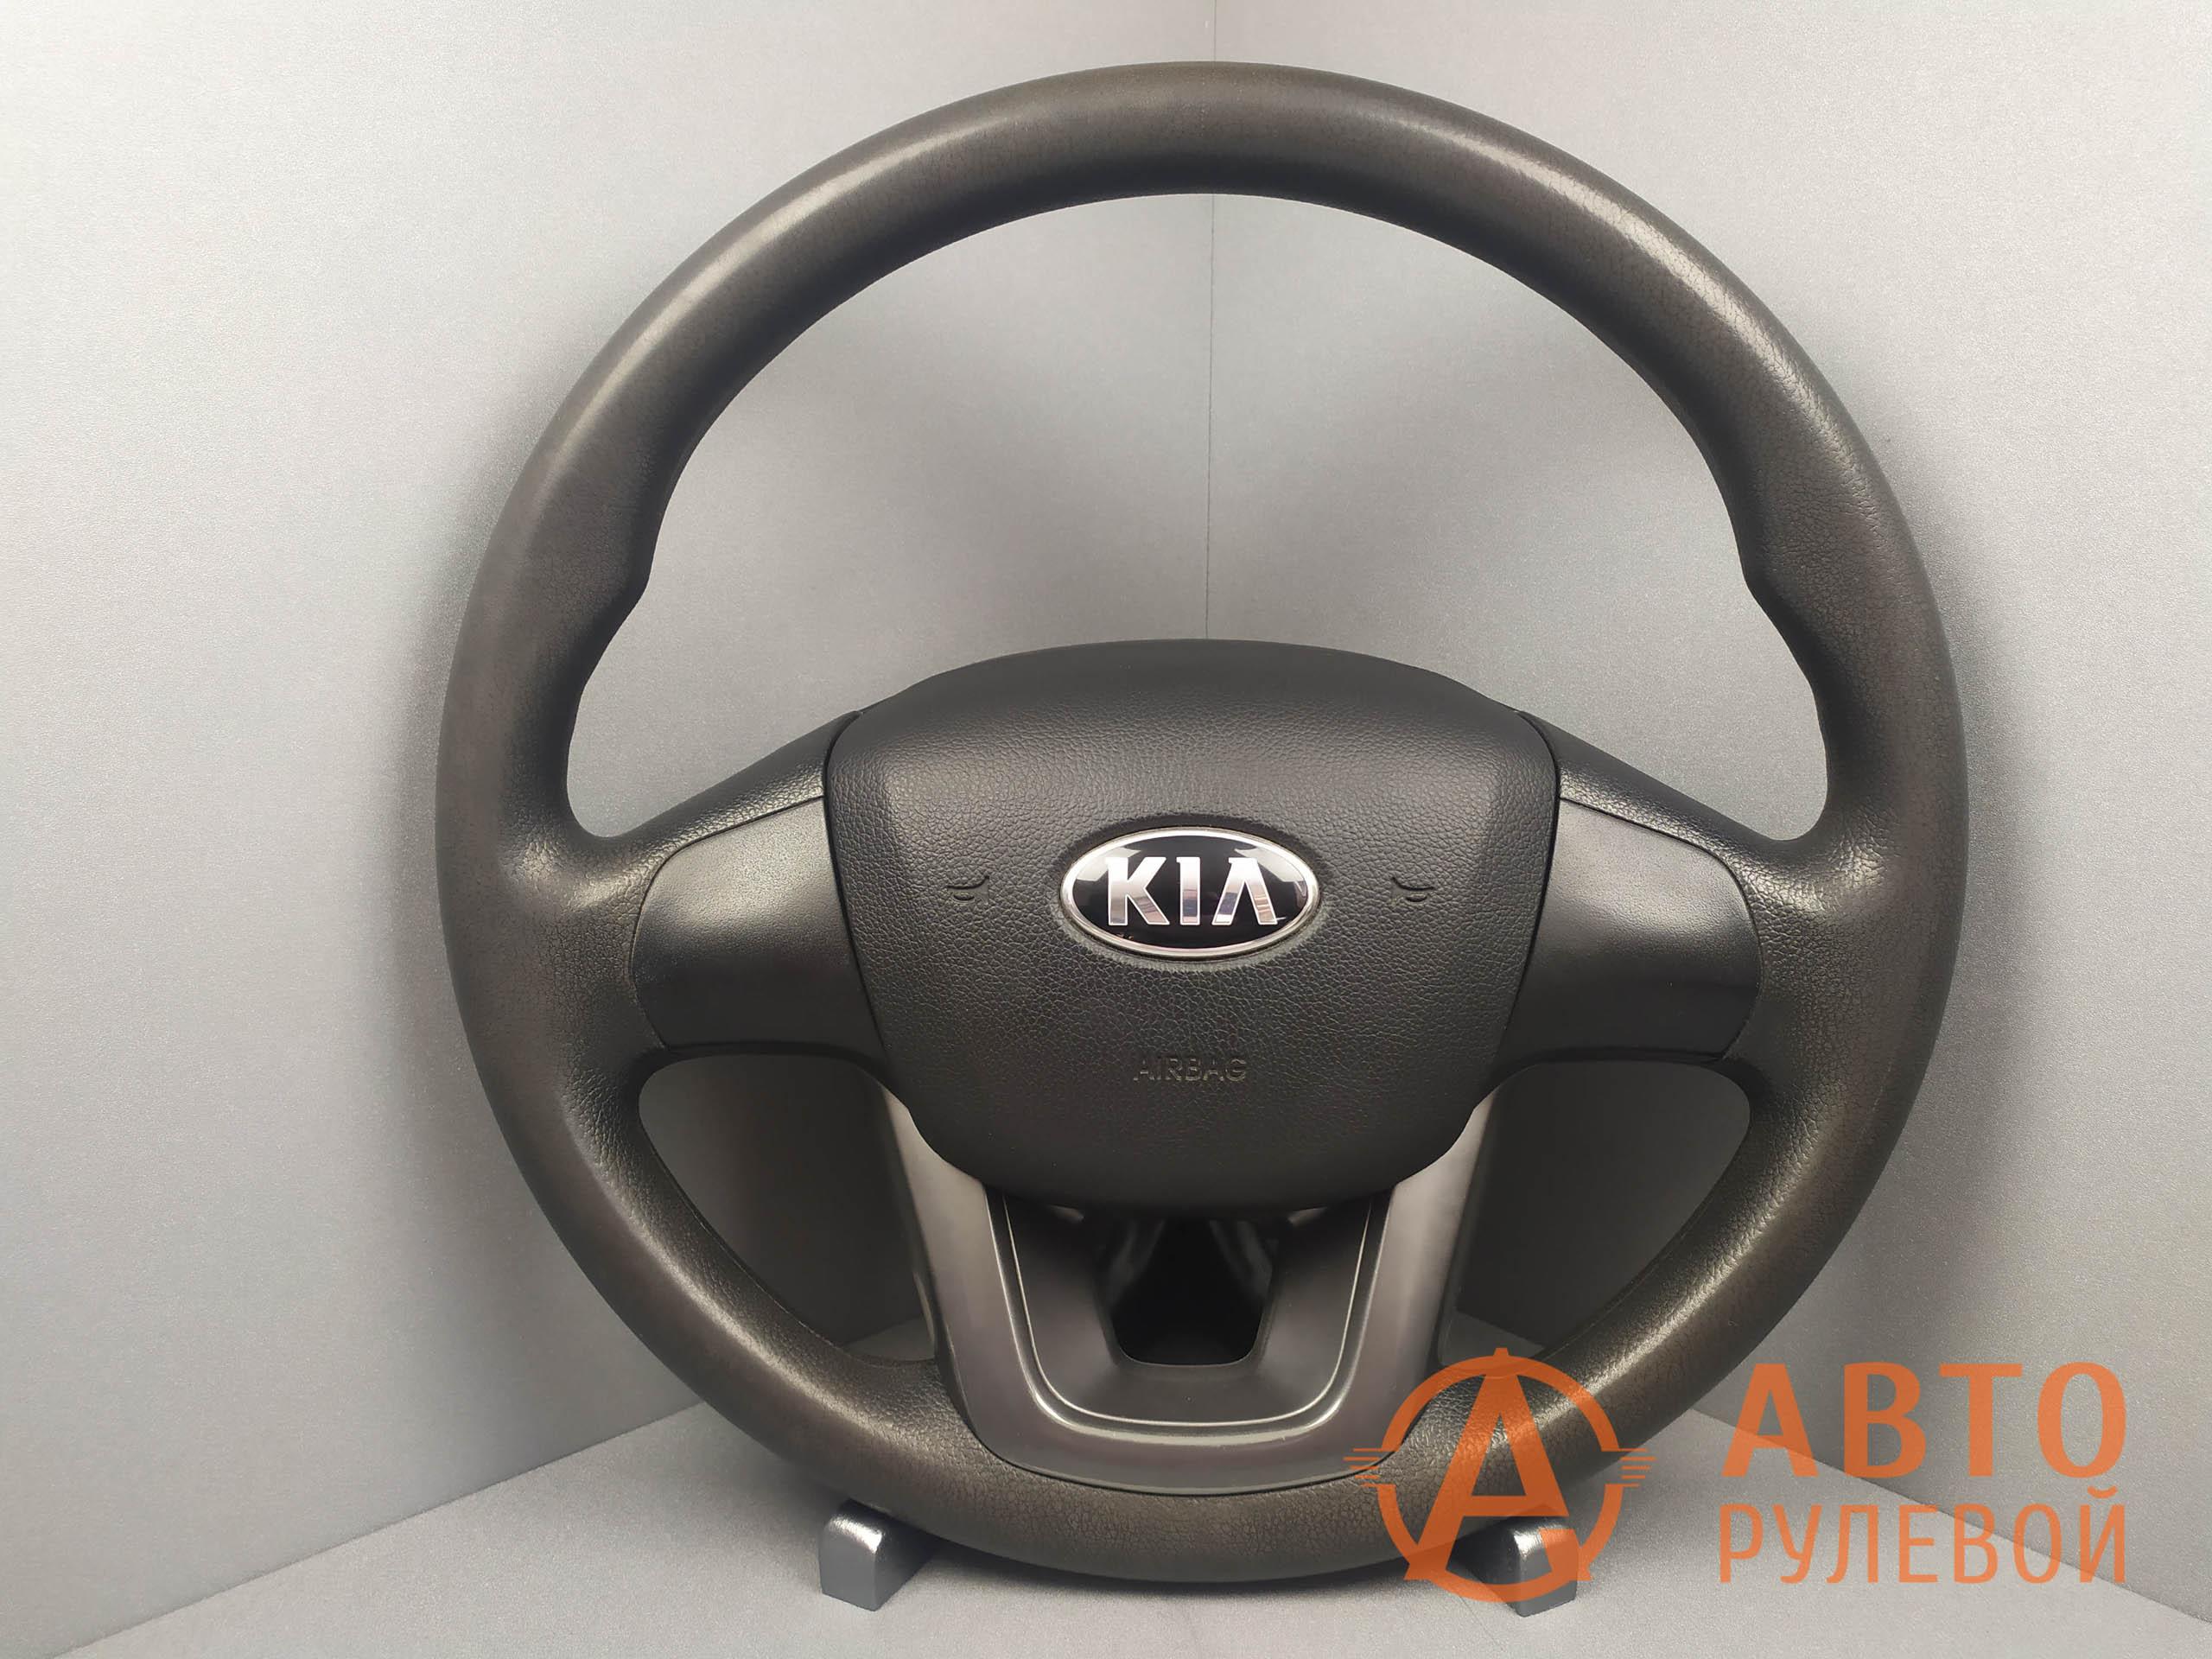 Руль Kia Rio 3 поколение 2013 до перетяжки